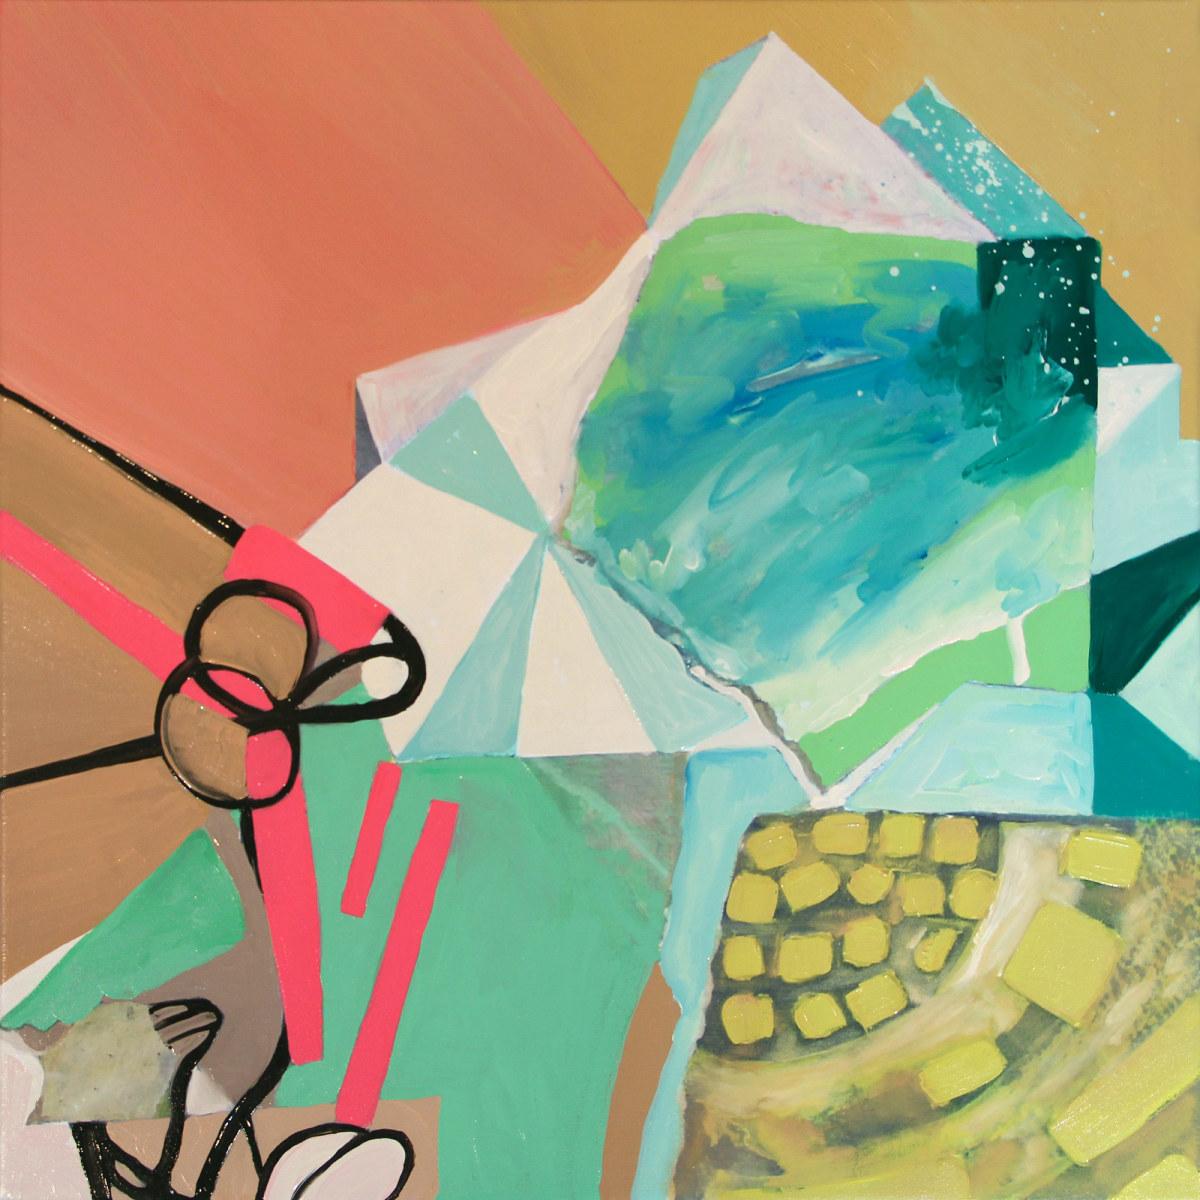 Radiate, Variation 1 by Pamela Staker